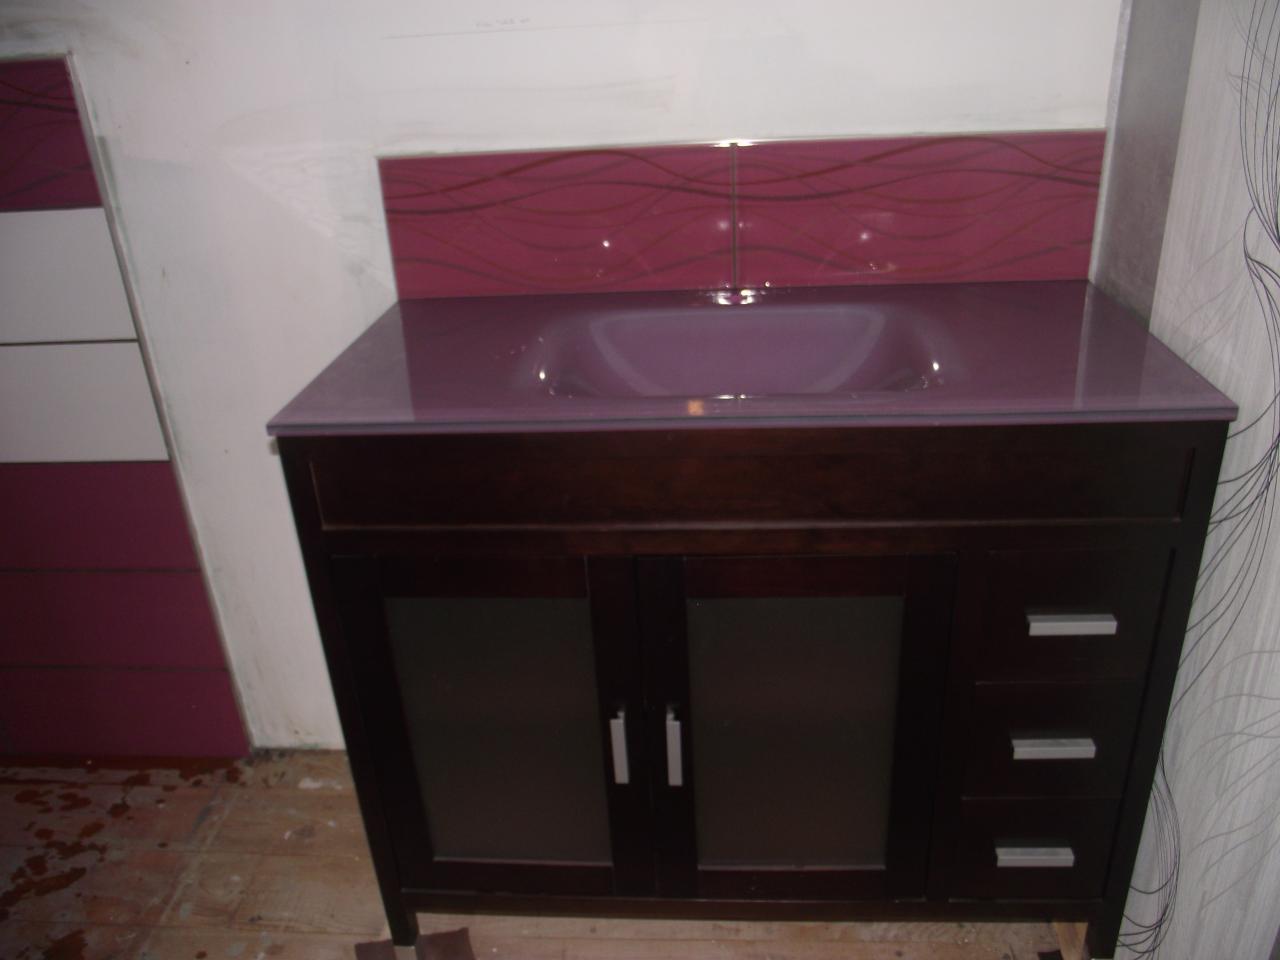 Carrelage pos au dessus lavabo sdb for Salle de bain ums